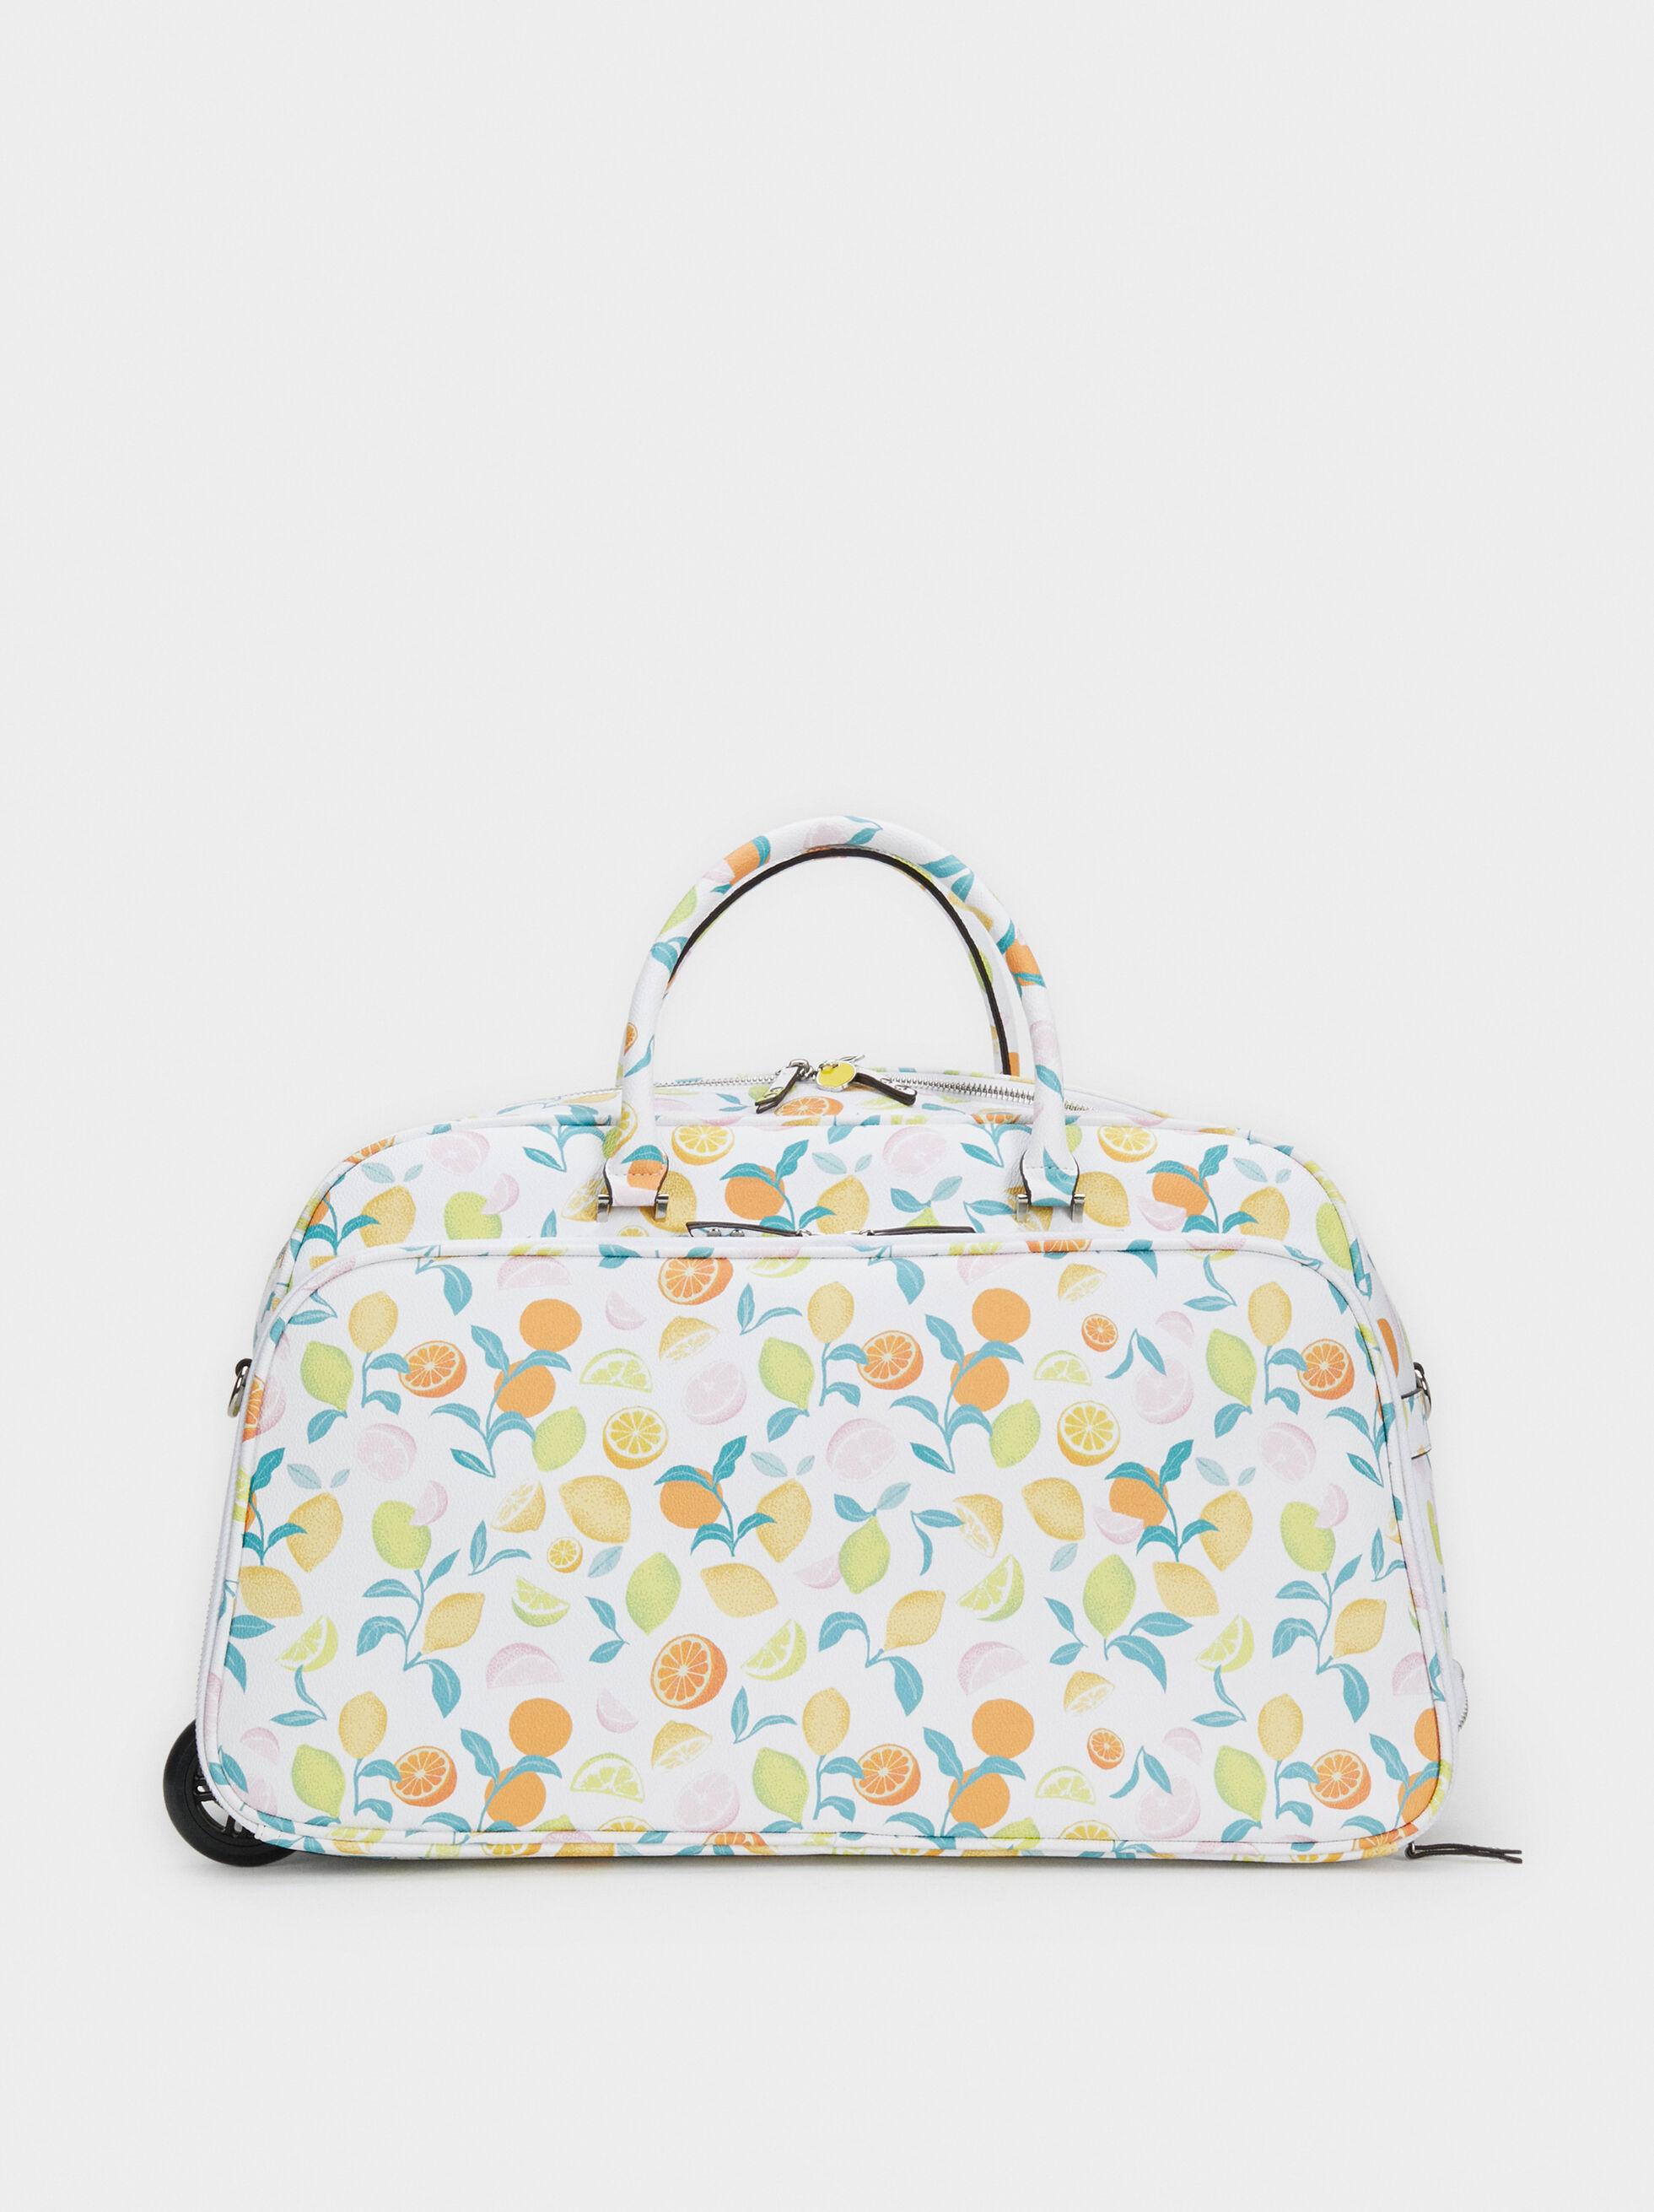 Fruit Print Travel Bag, Orange, hi-res